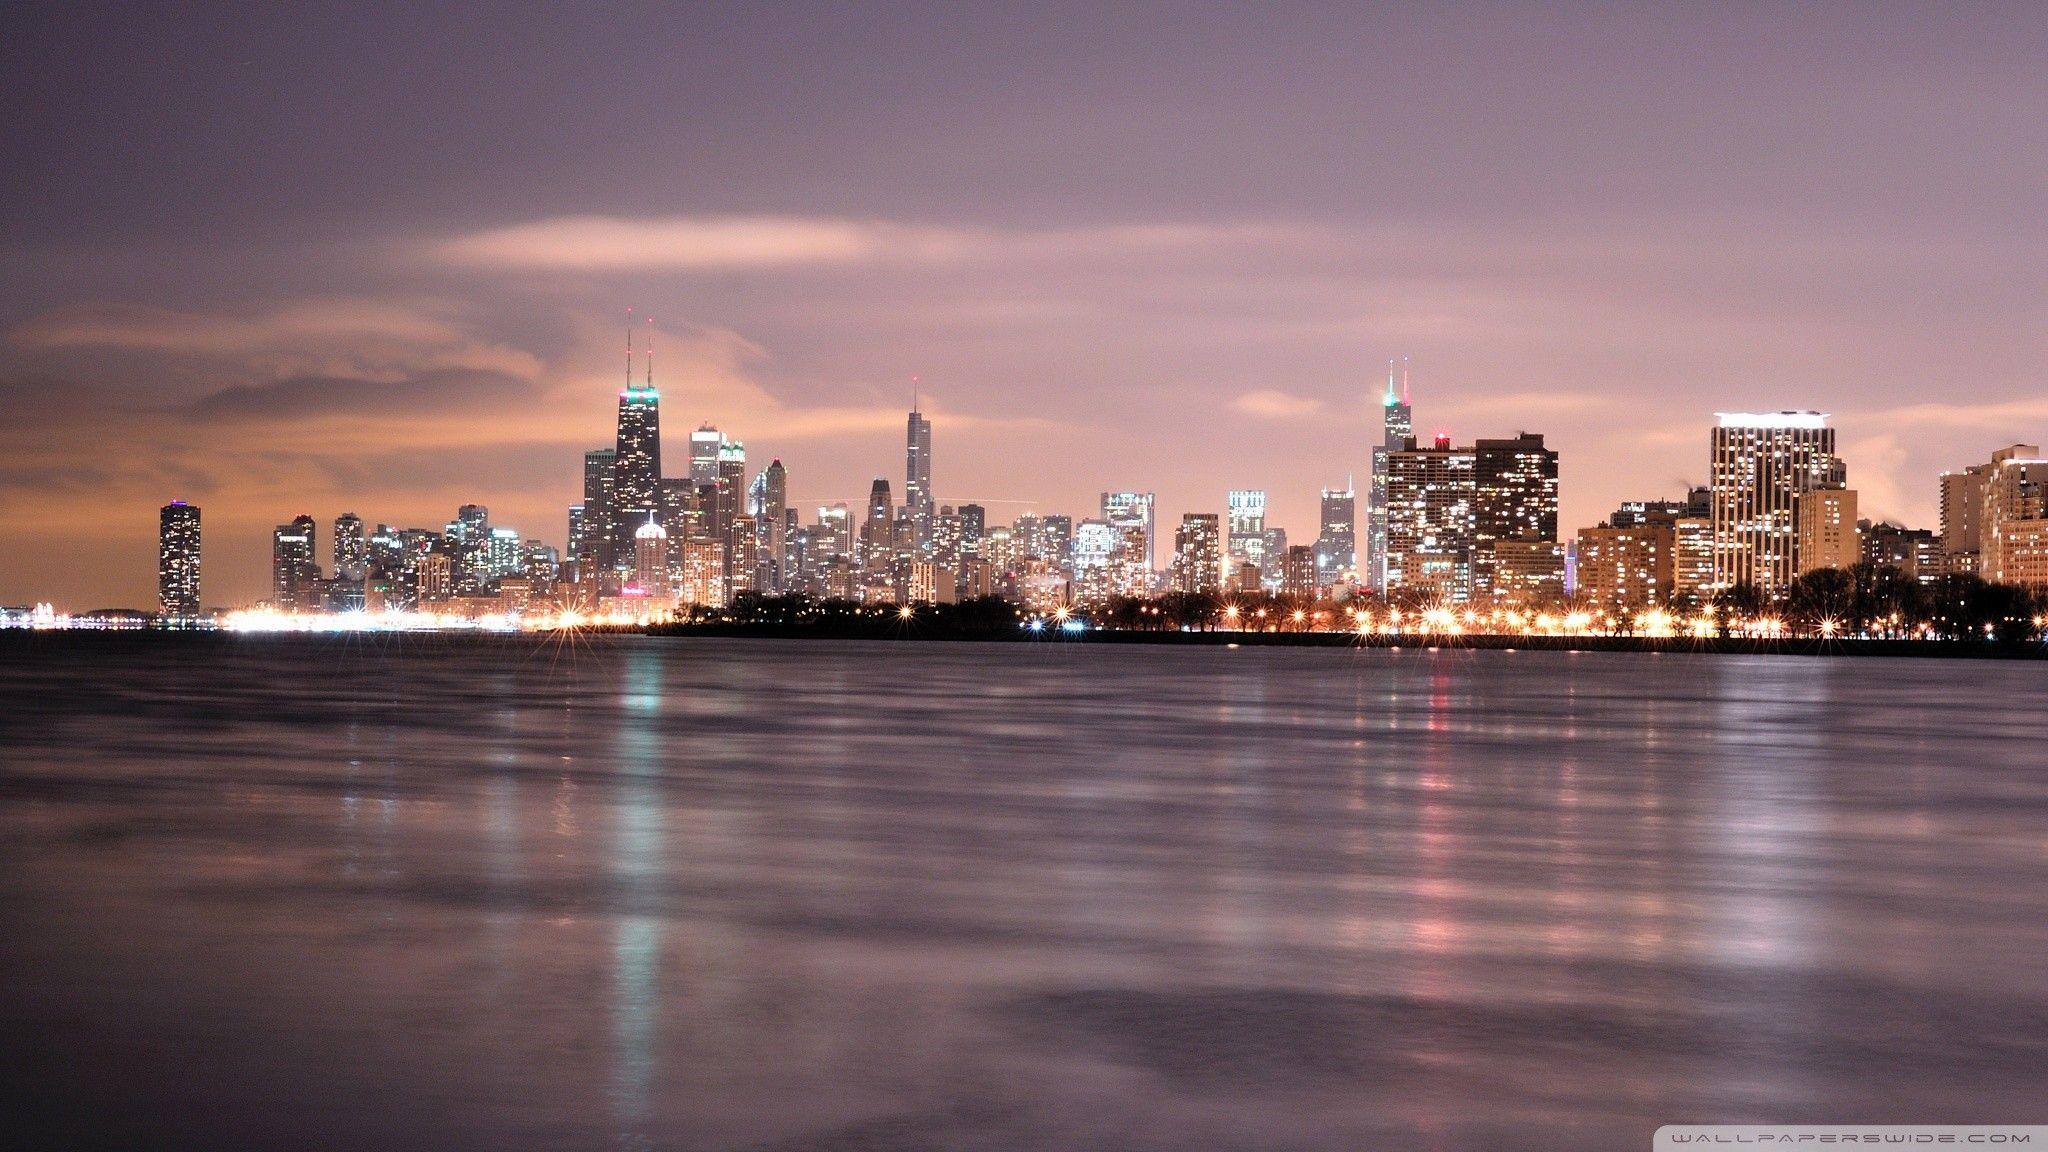 2048x1152 Hd 16 9 Chicago Skyline Skyline Night Skyline